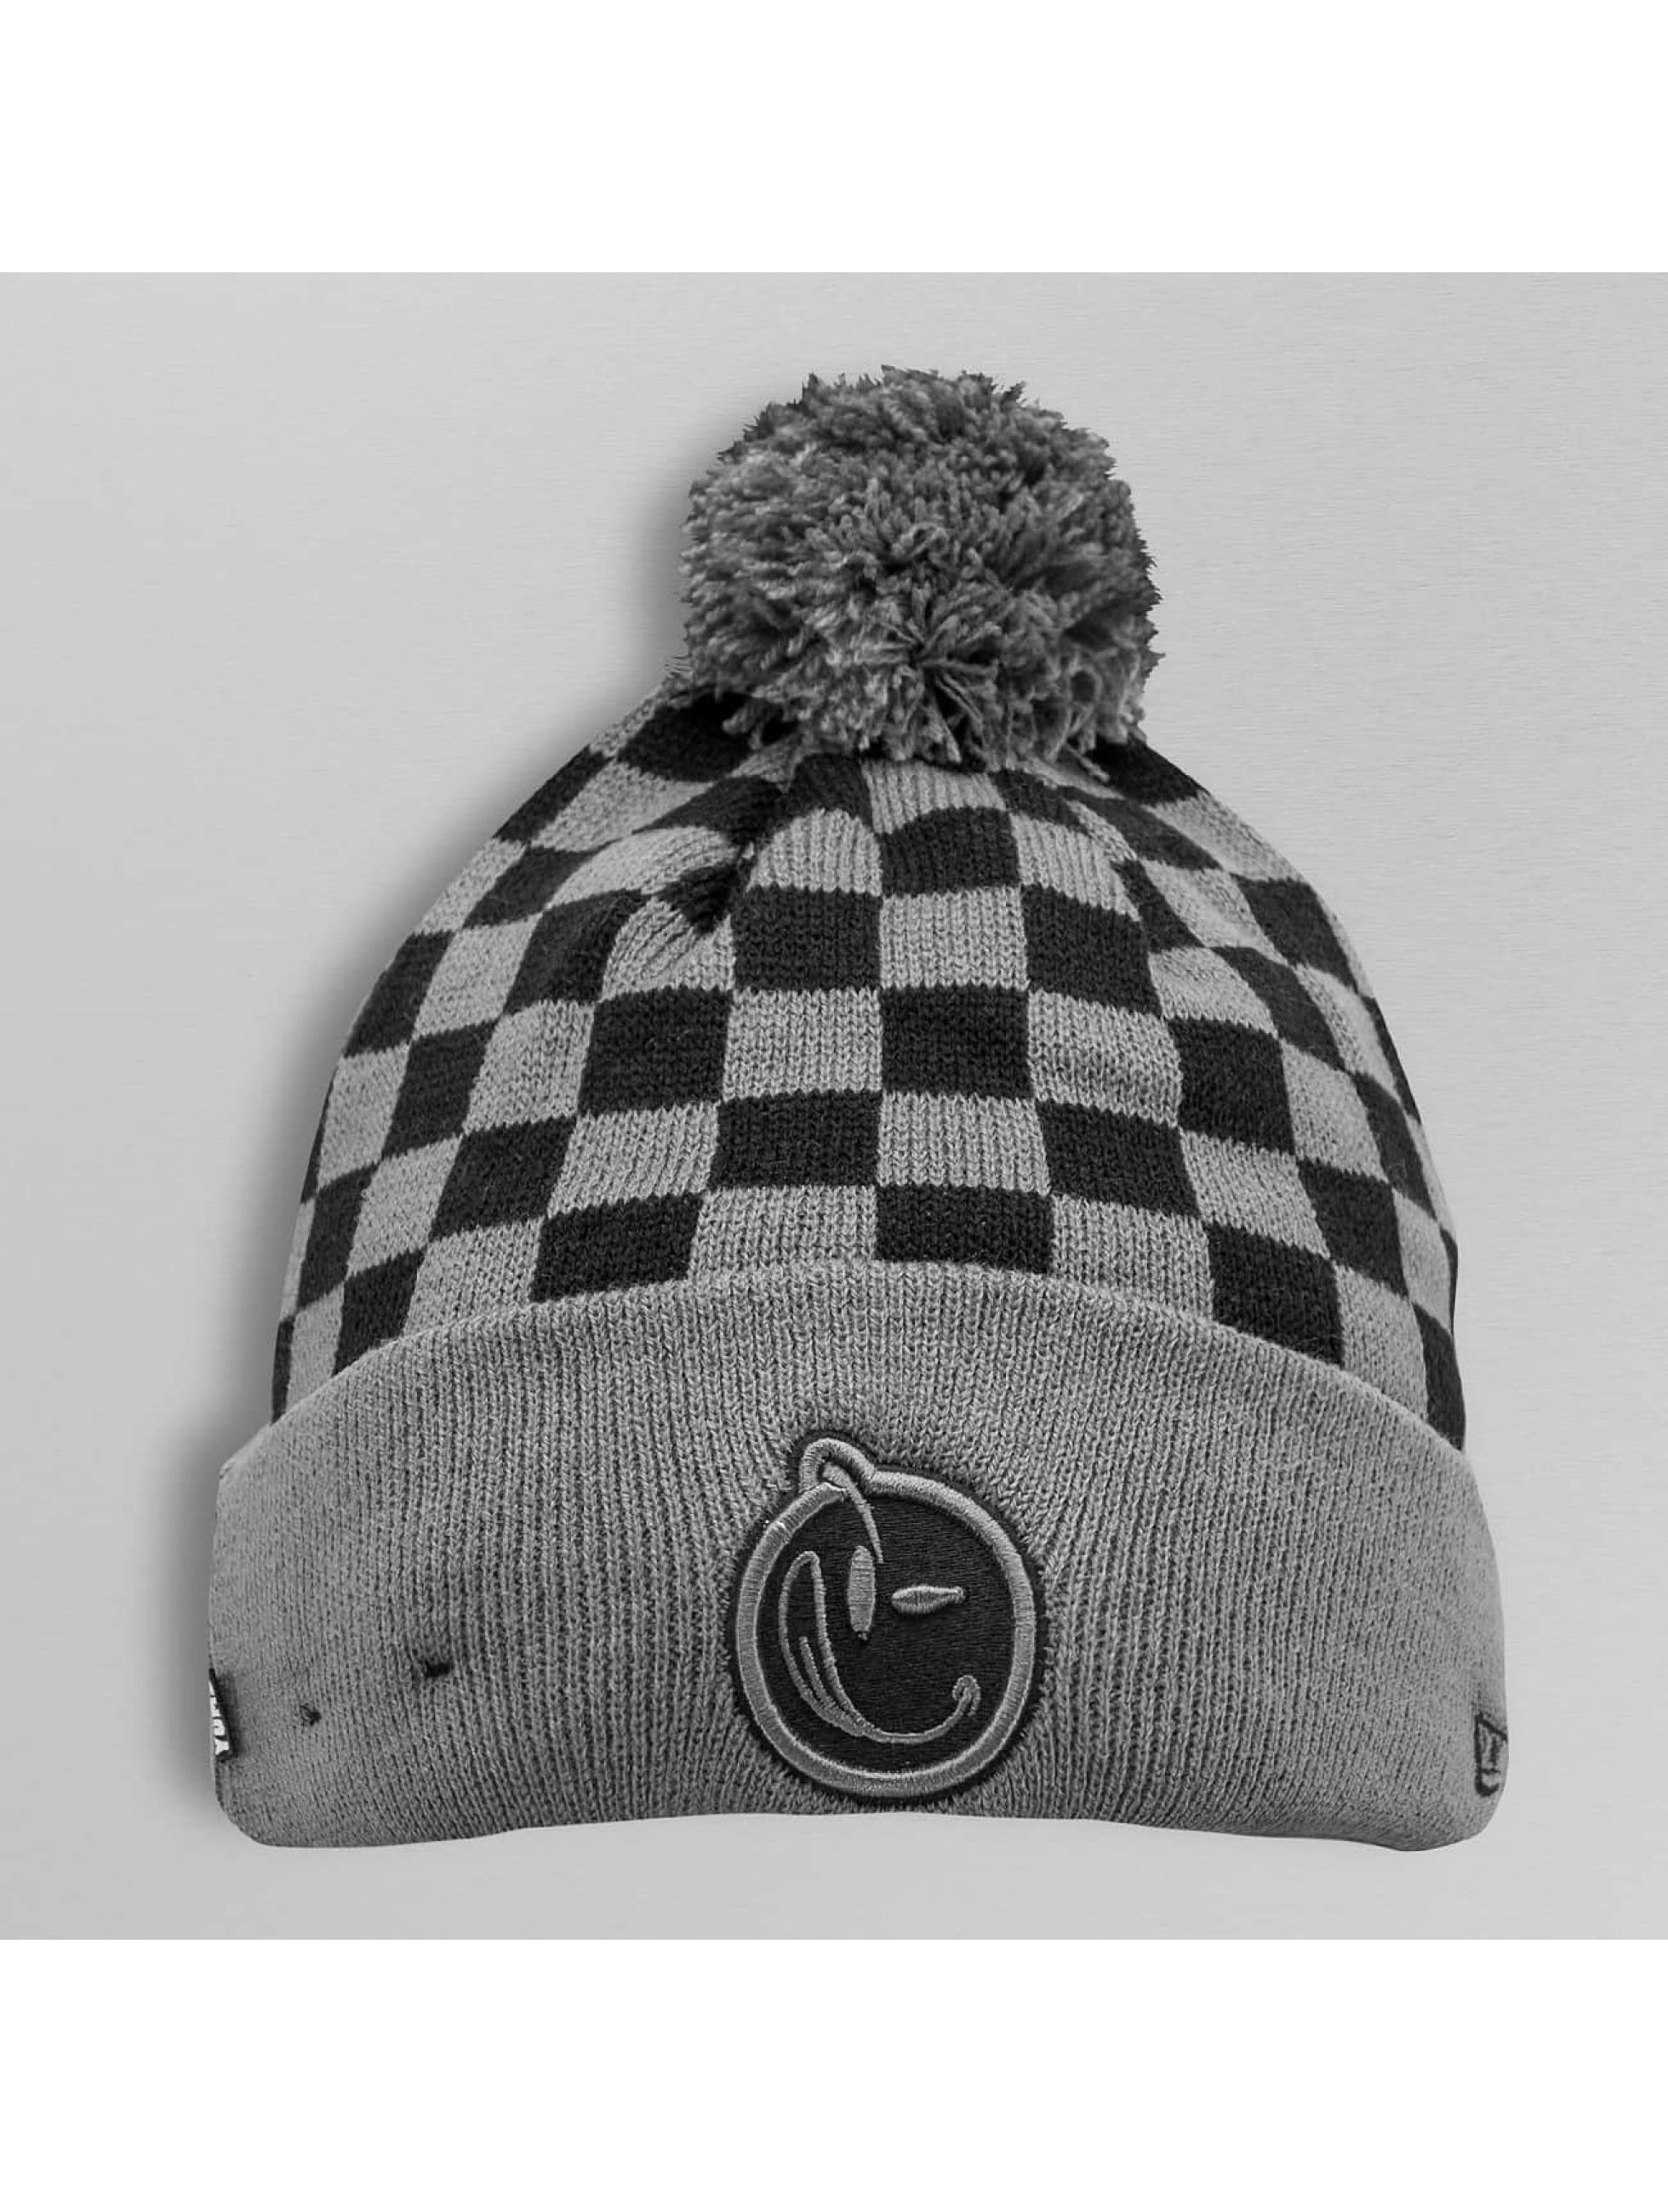 Wintermütze Pom Checkered in schwarz